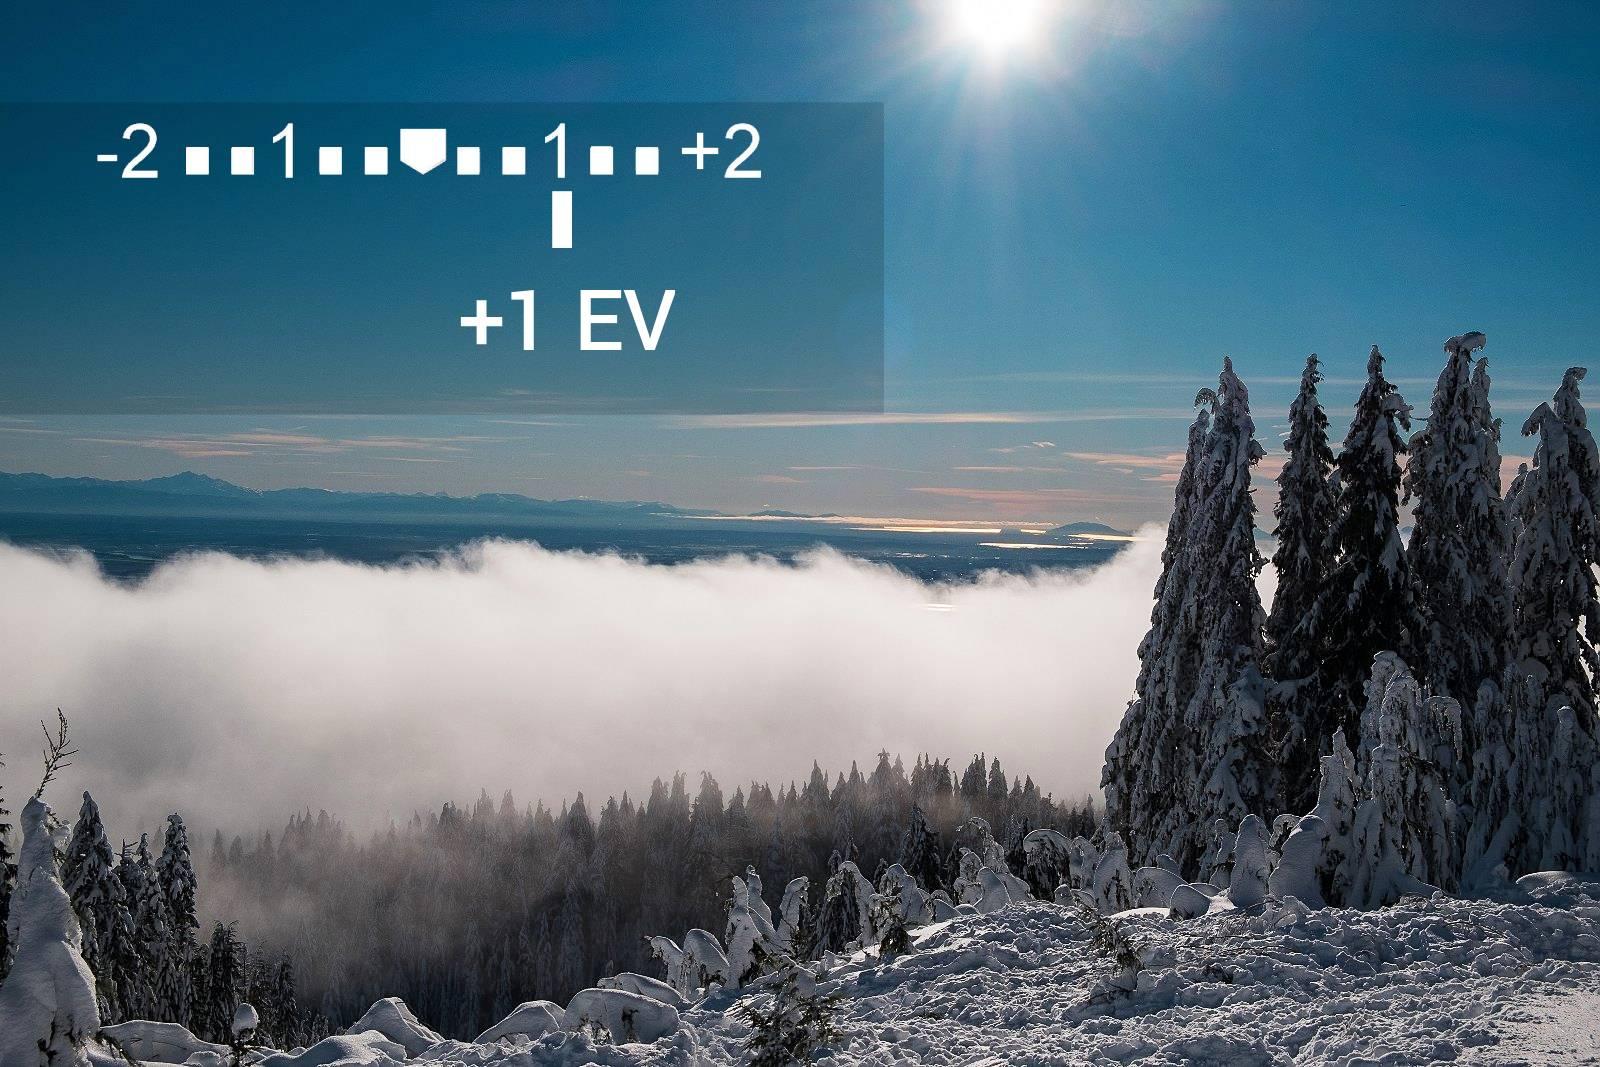 Korekce expozice +1EV